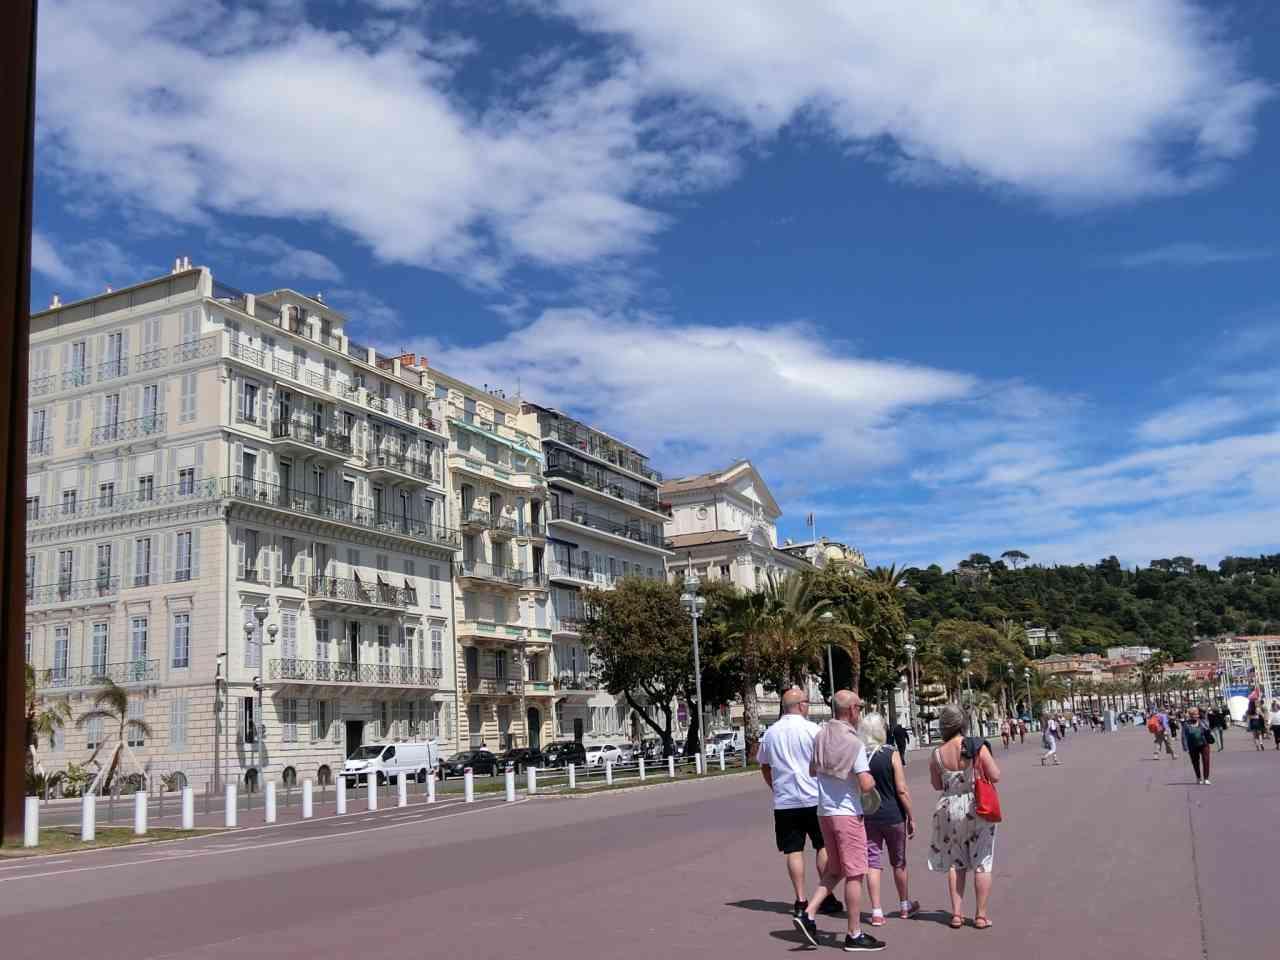 【郵輪 巴塞隆納】Day8 Villefranche Sur Mer(Nice尼斯)